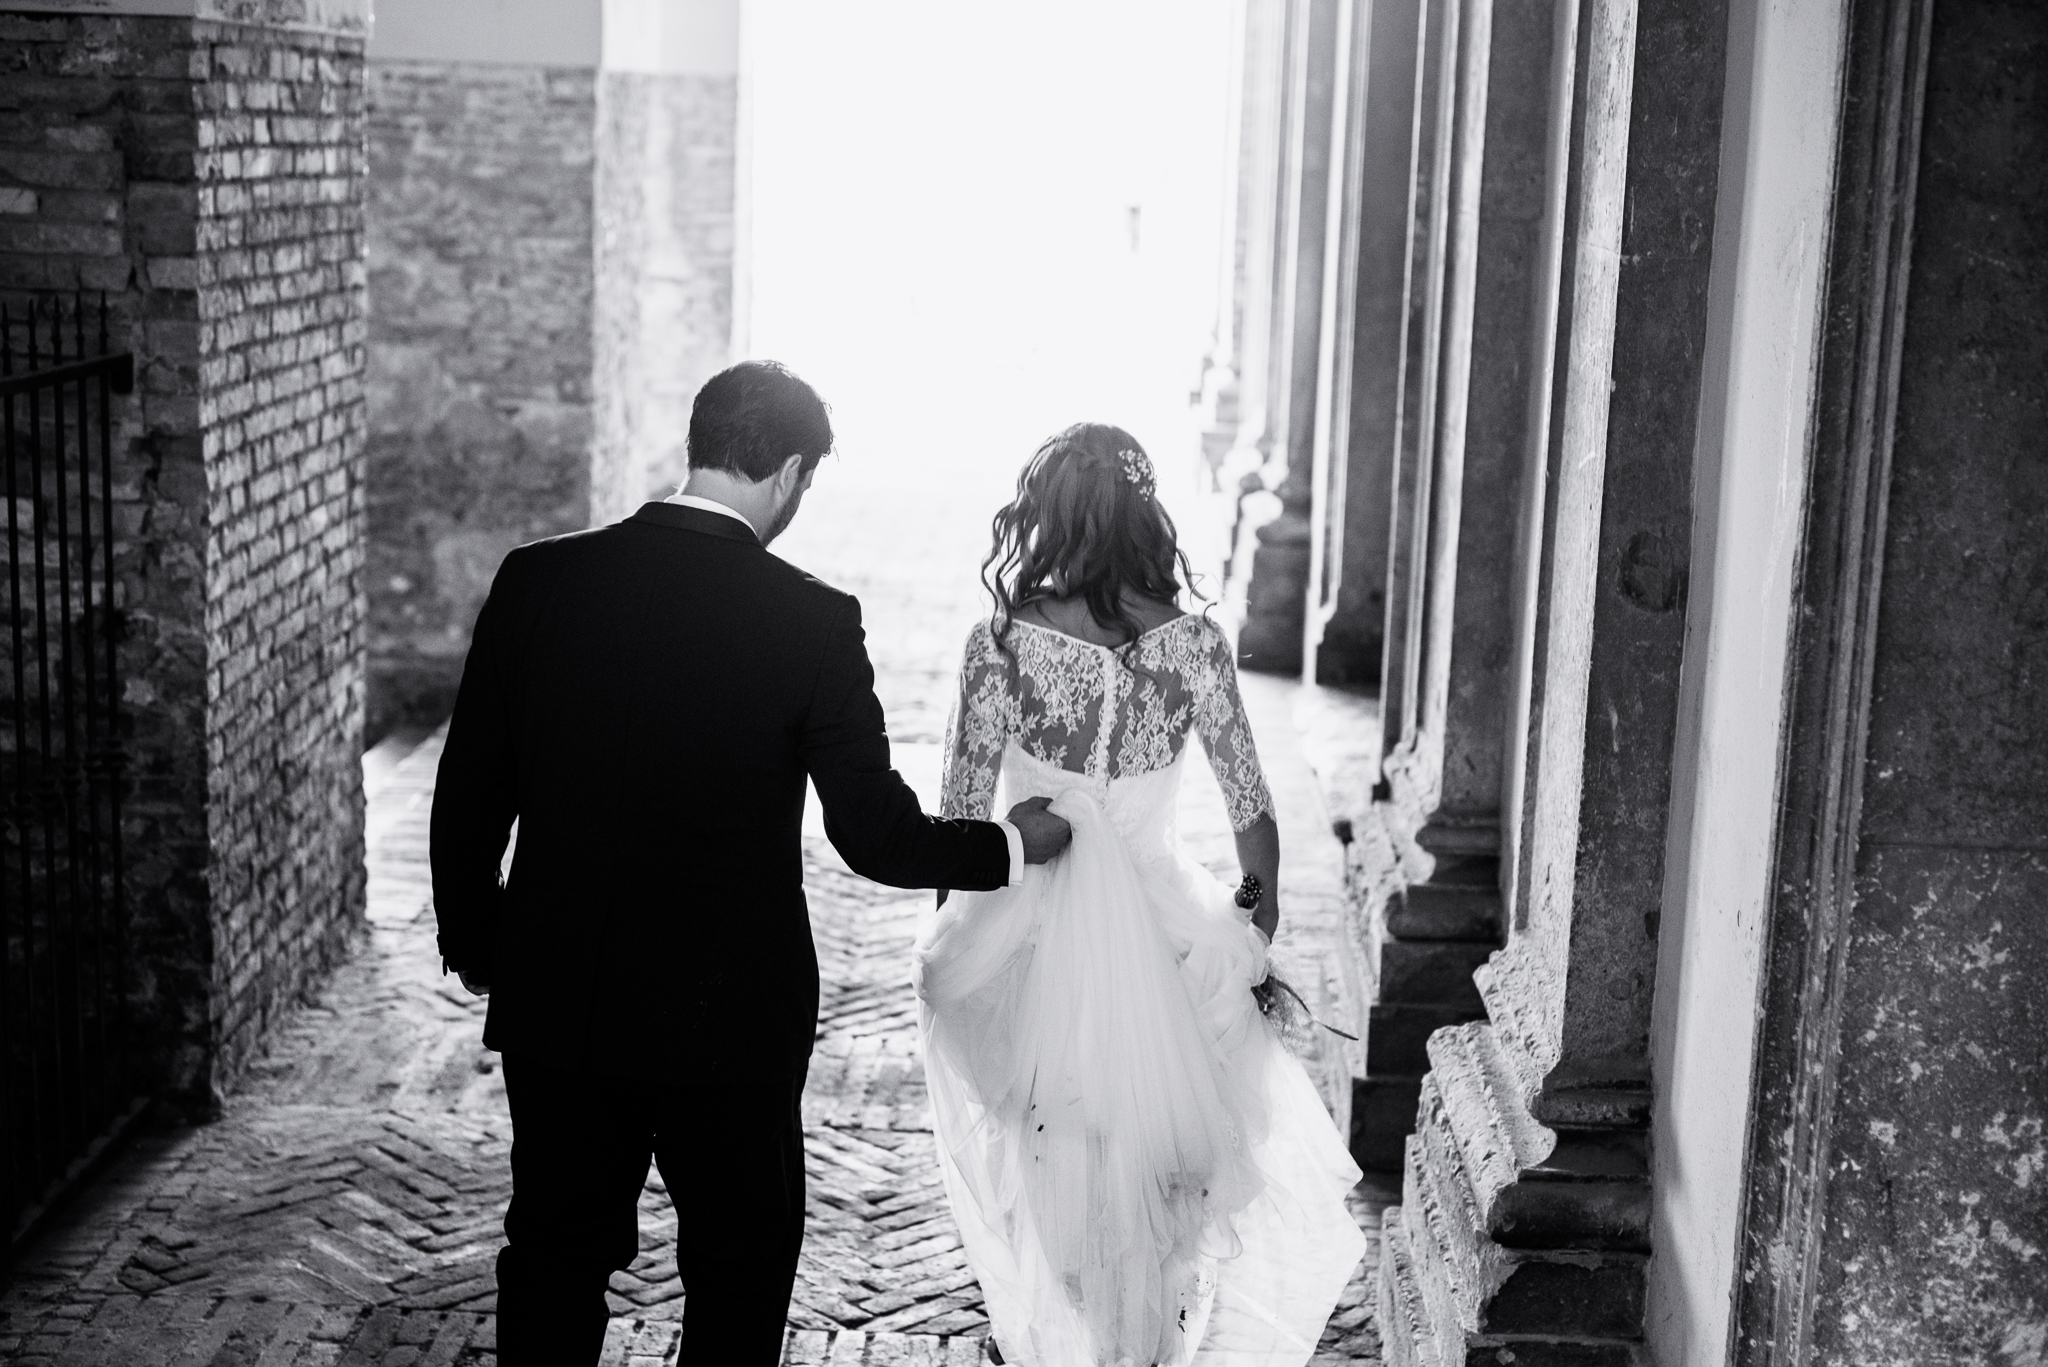 Giulia+Masci+Fotografo+Wedding+Forlì-401.jpg